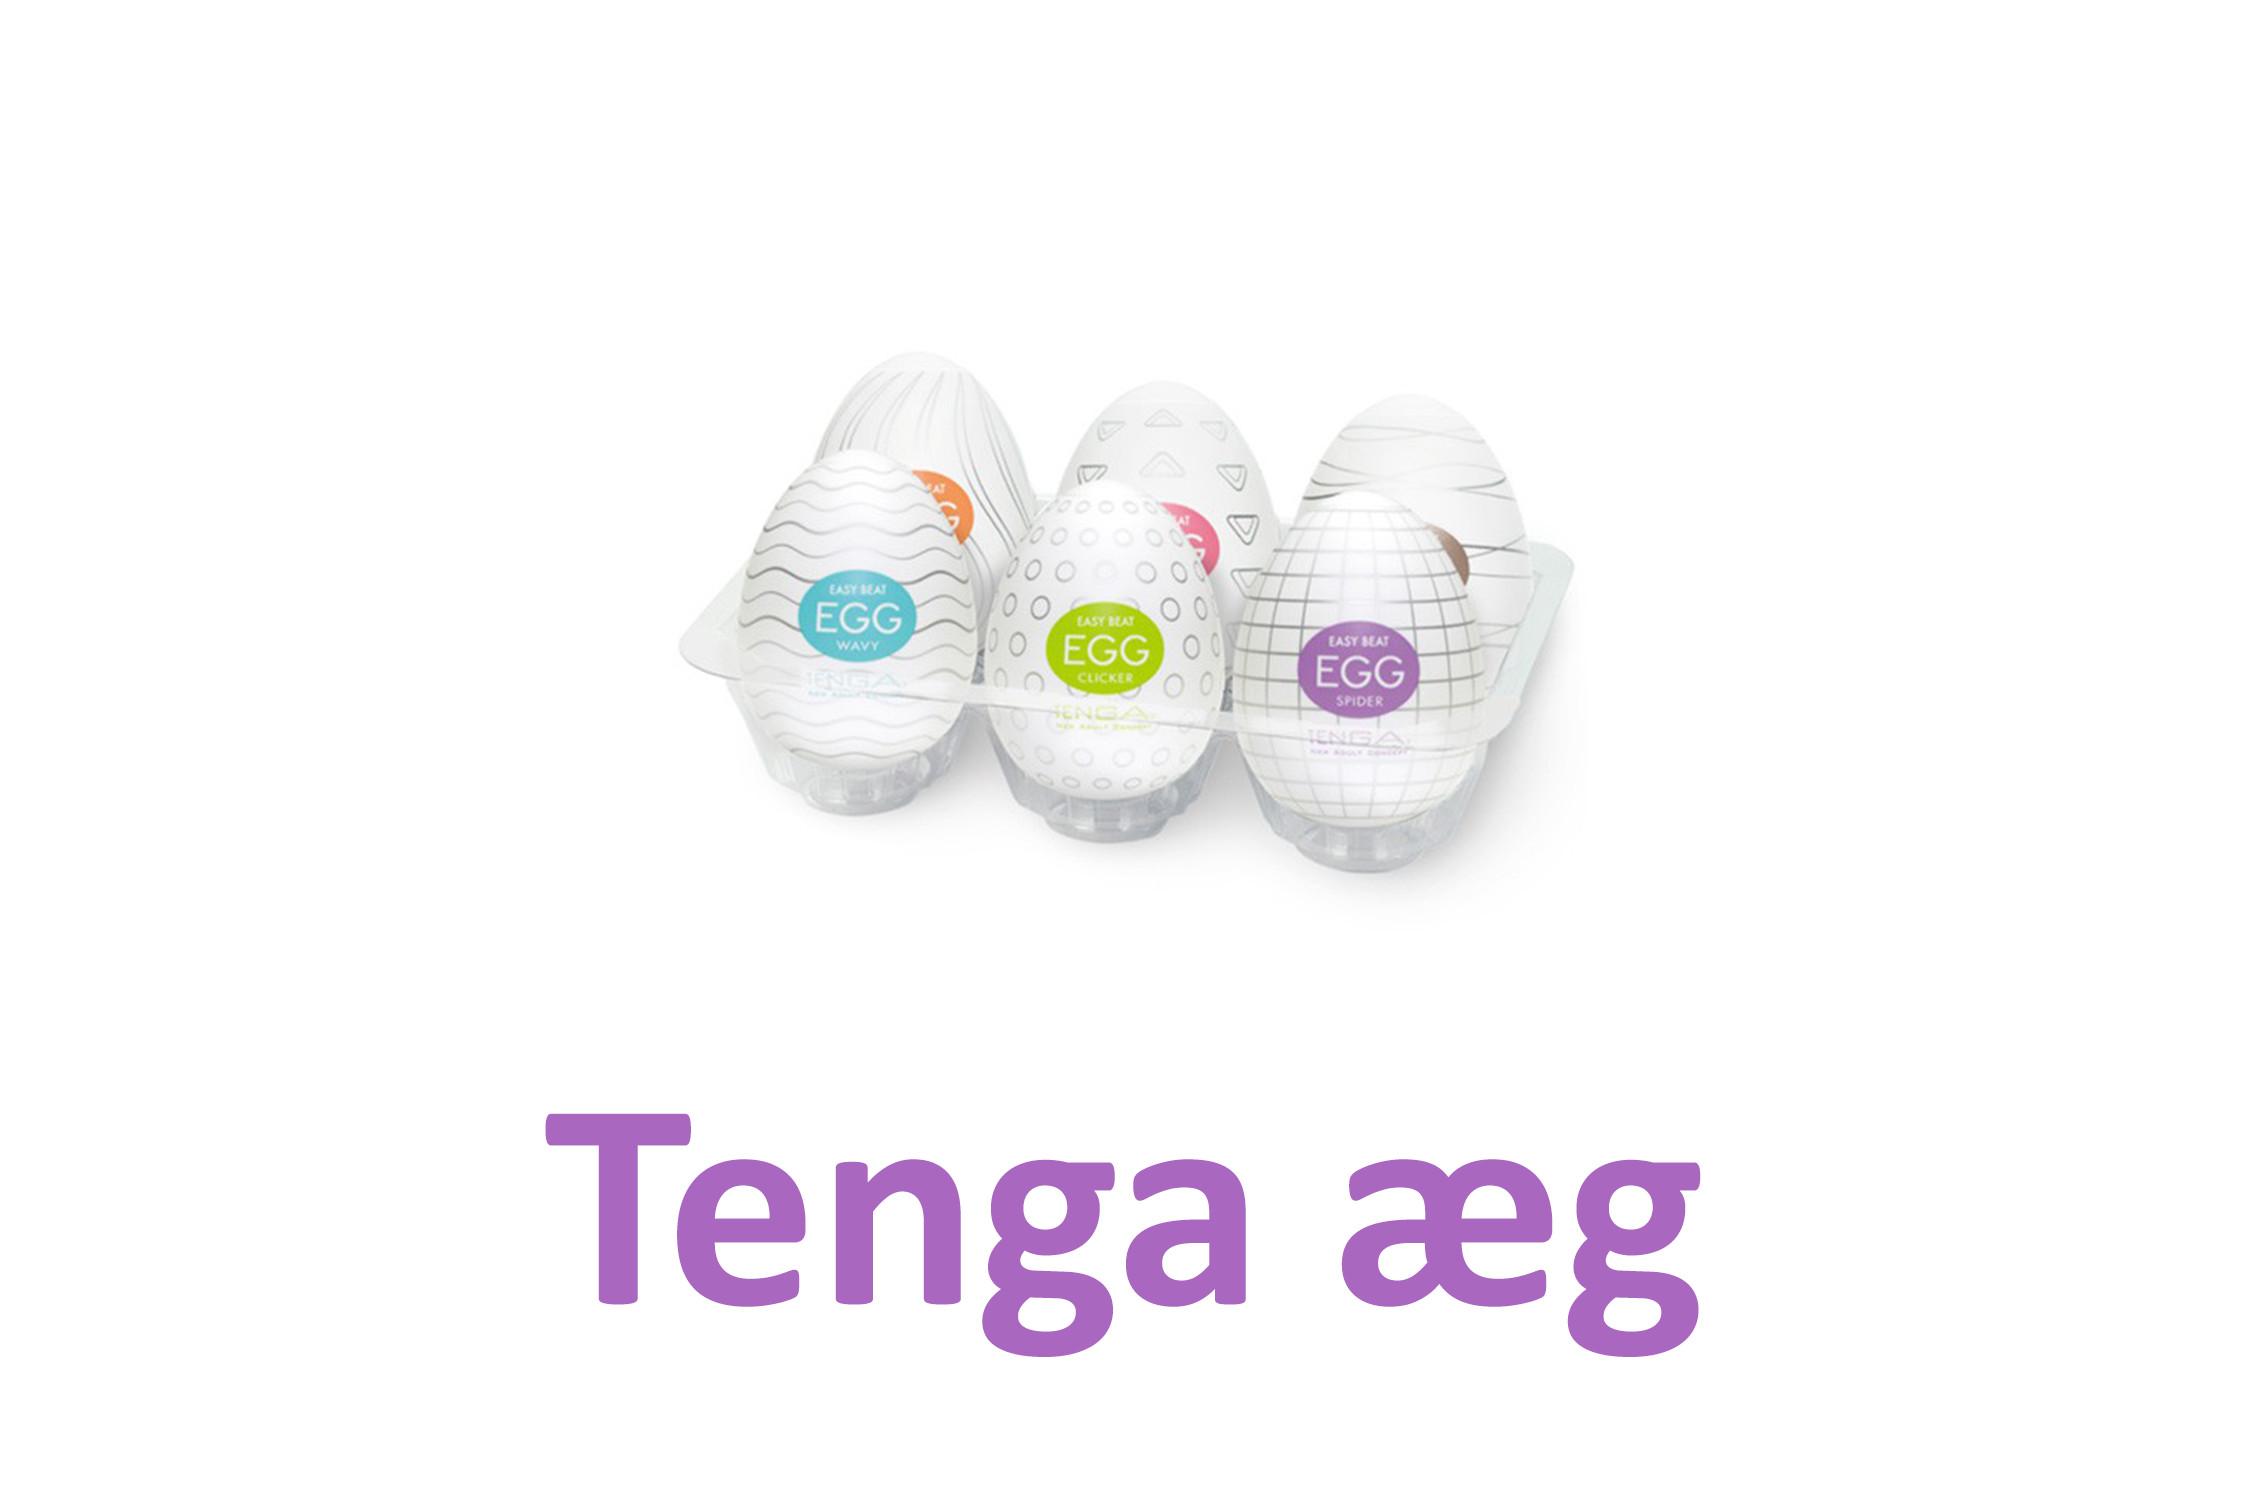 Tenga æg - Handjob guide